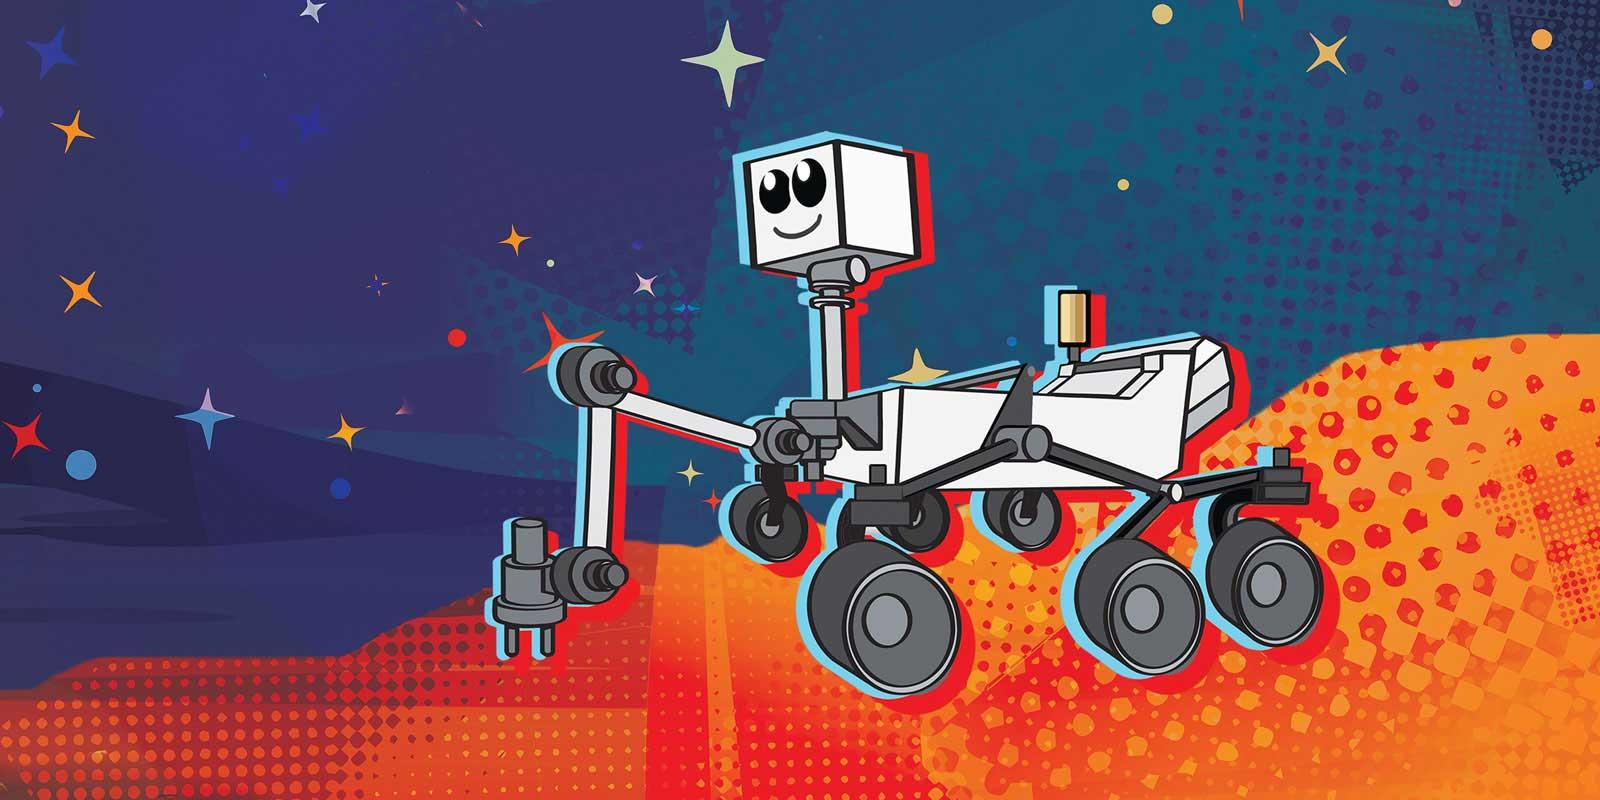 Name the rover!